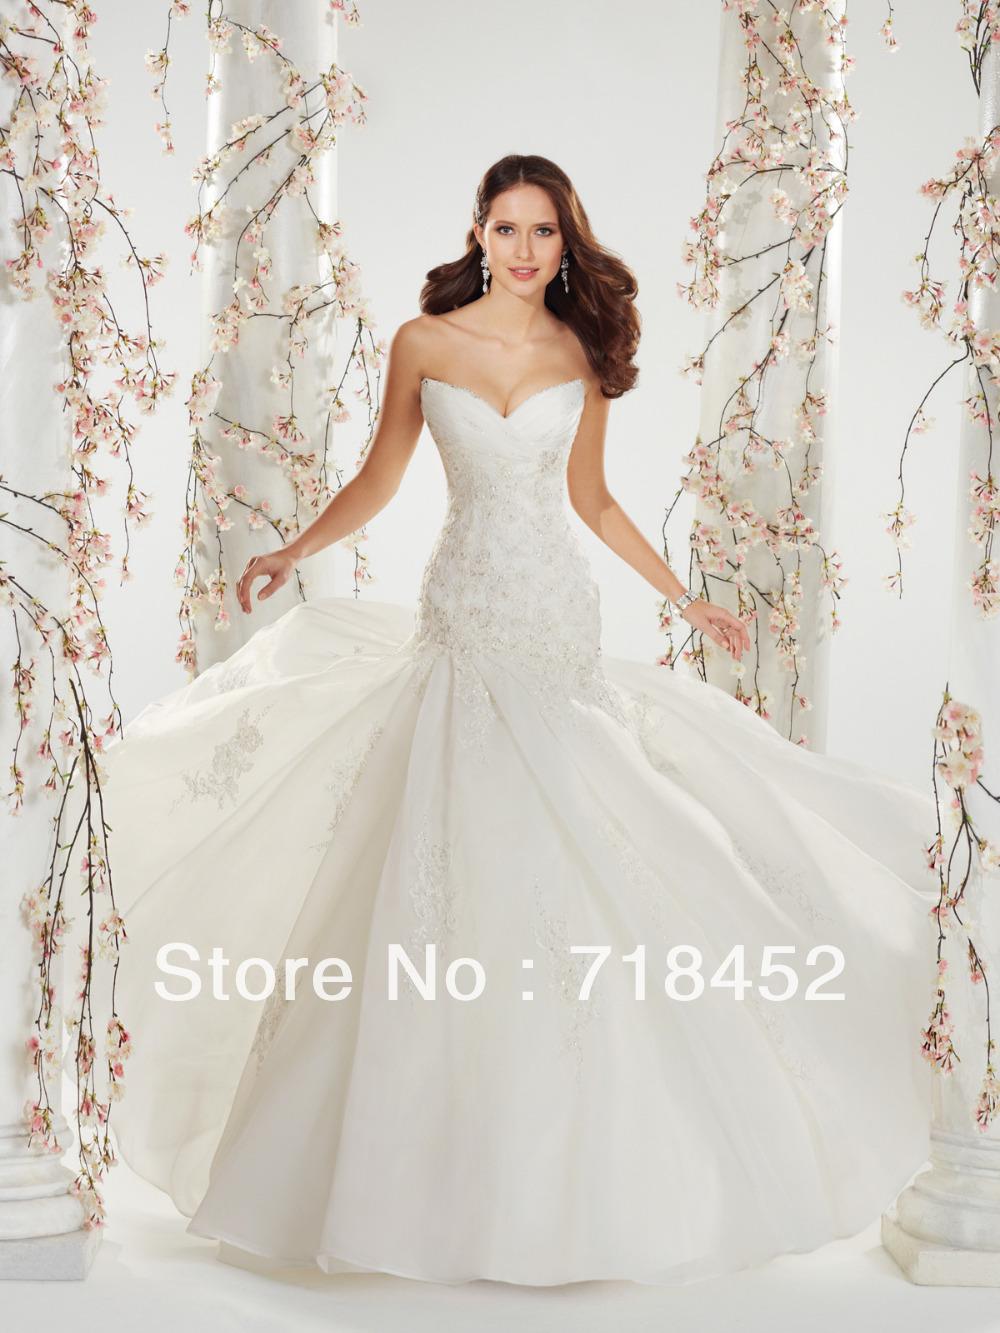 Buy simple design white organza dress for Off the shoulder wedding dress topper